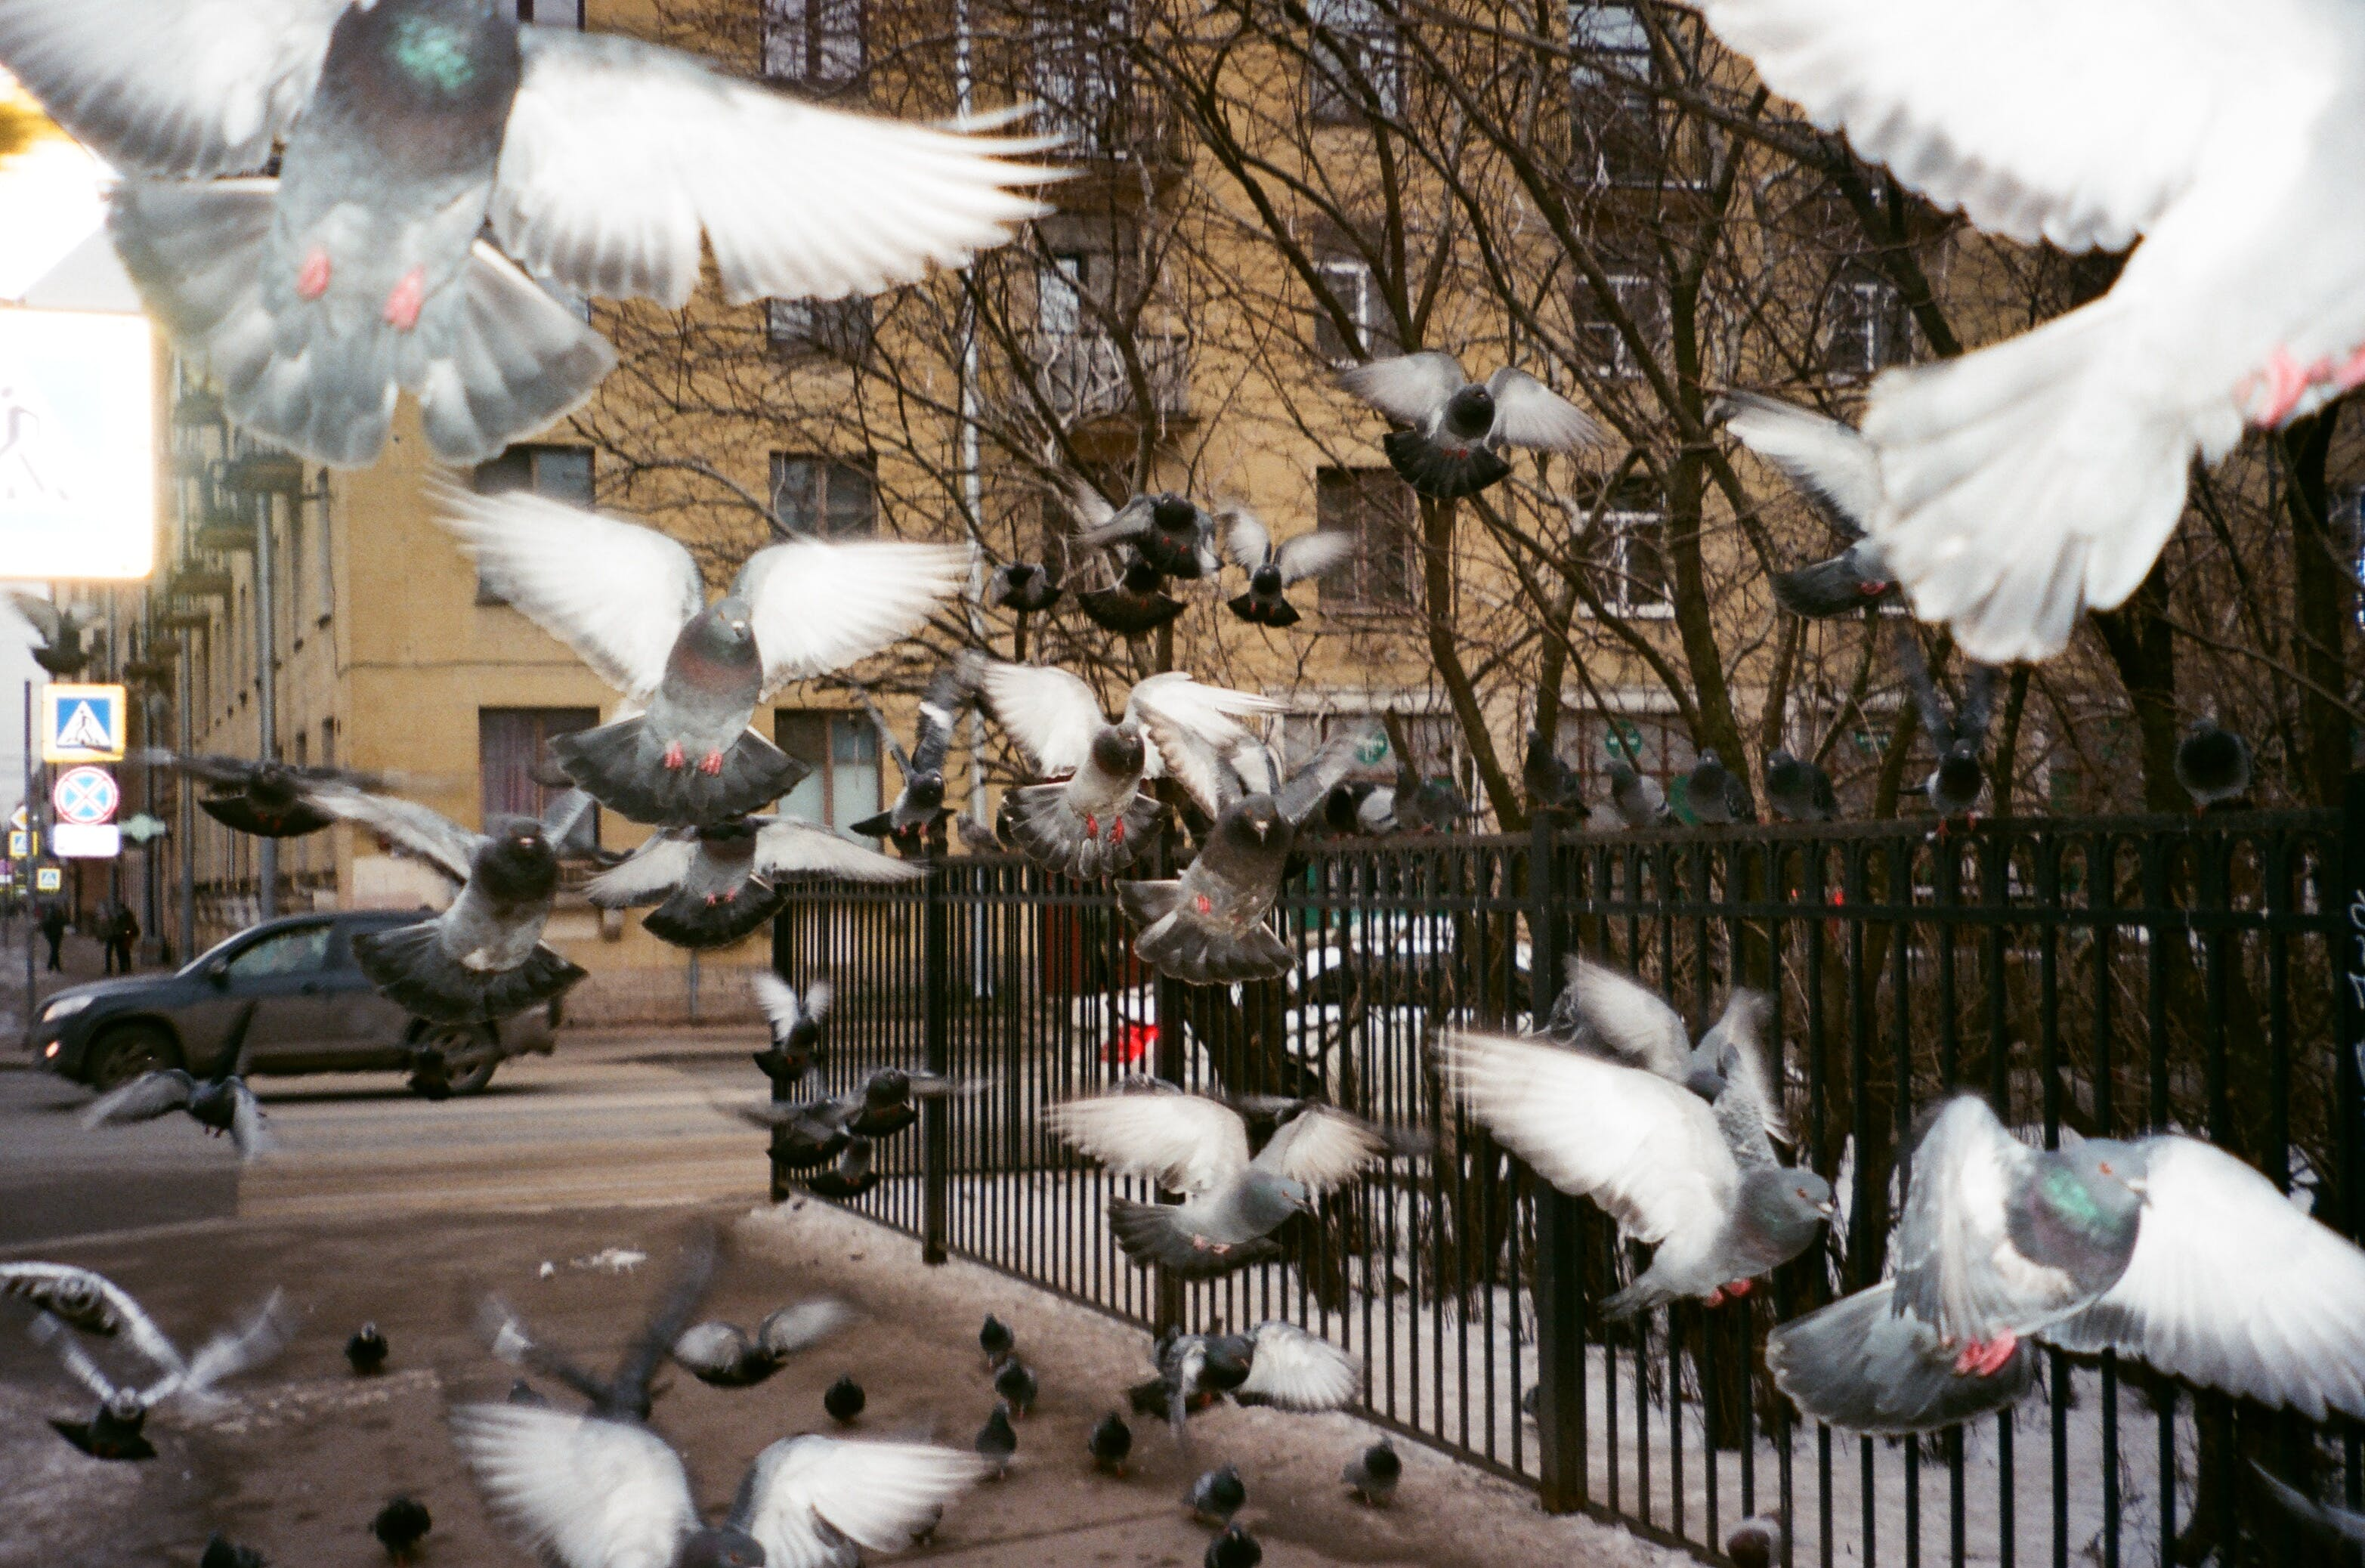 Flock of Pigeons Near Black Fence